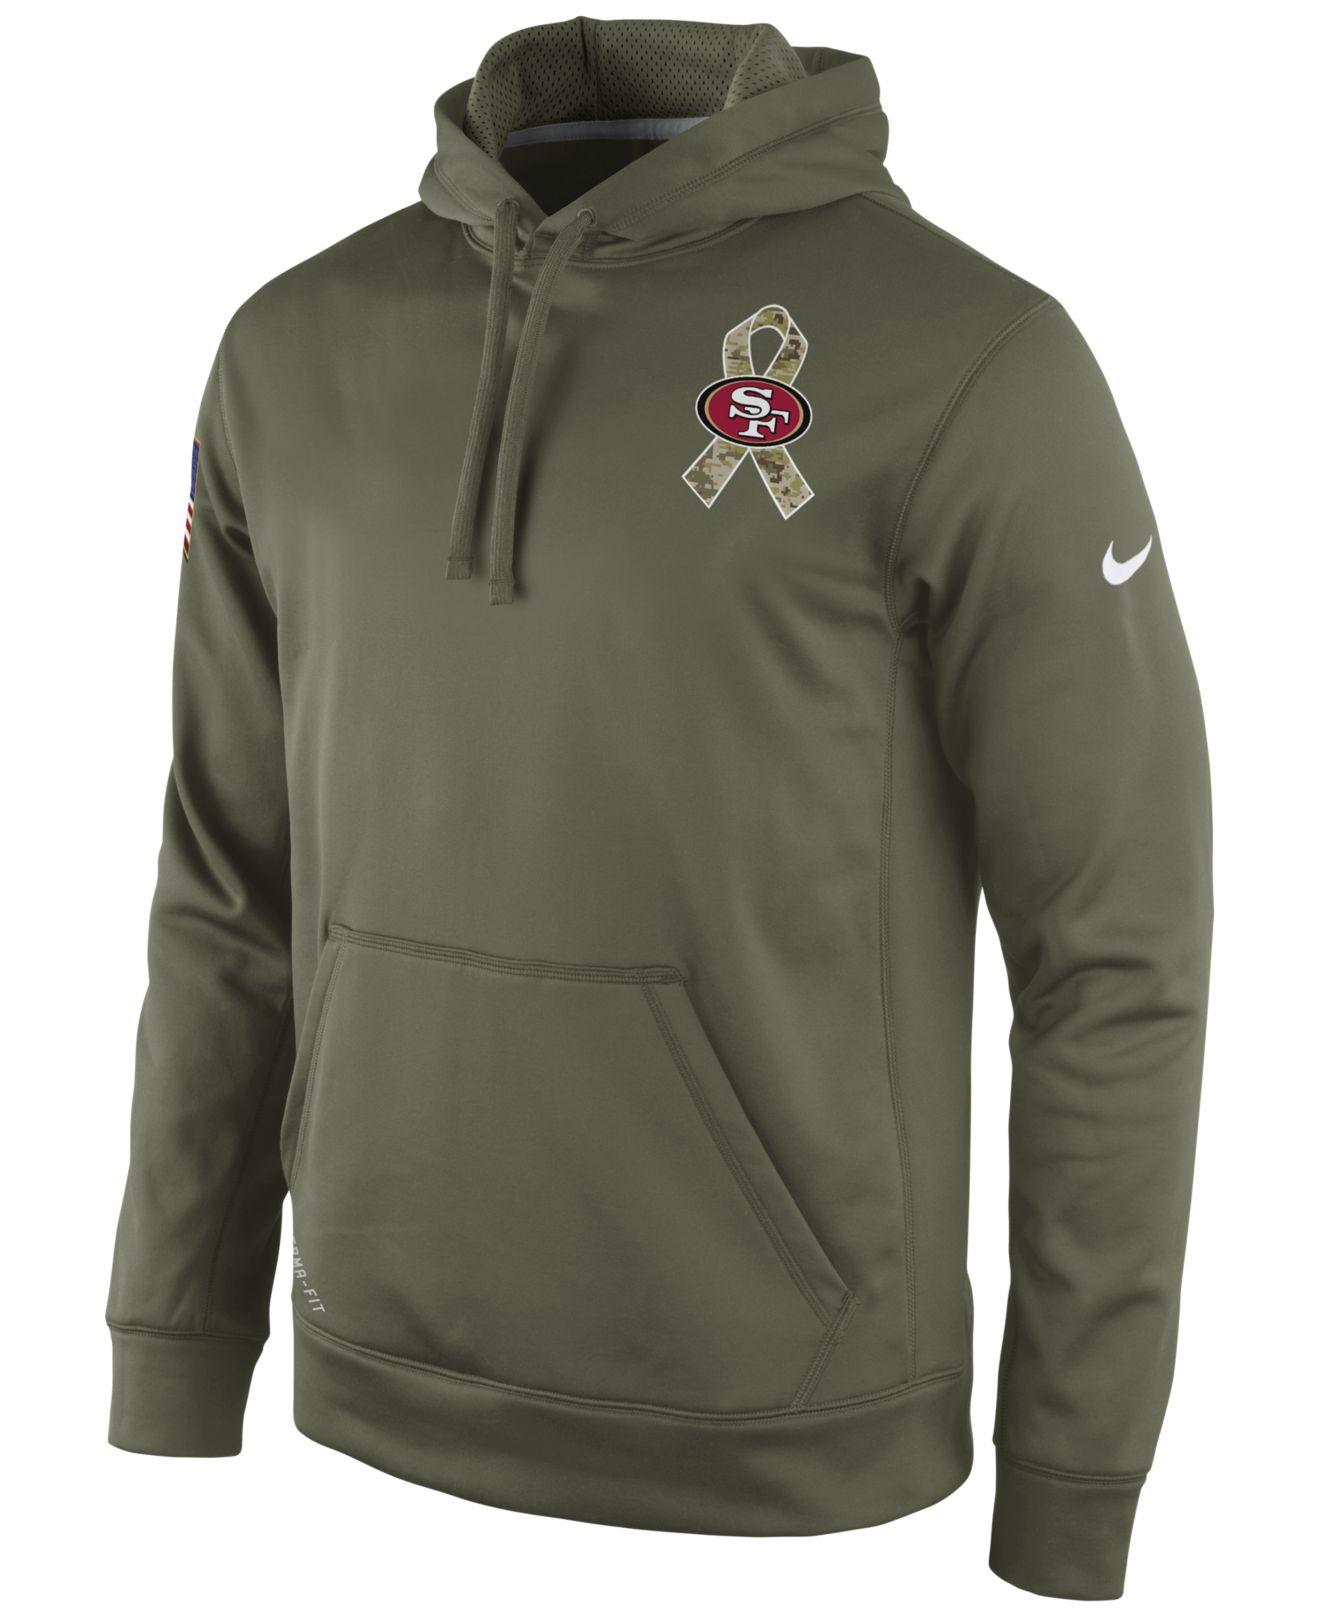 d081c6691 ... Shirt Nike MenS San Francisco 49Ers Salute To Service Ko Hoodie in NFL  San Francisco 49ers Nike Olive Salute To Service KO Performance Dri-FIT T-  ...